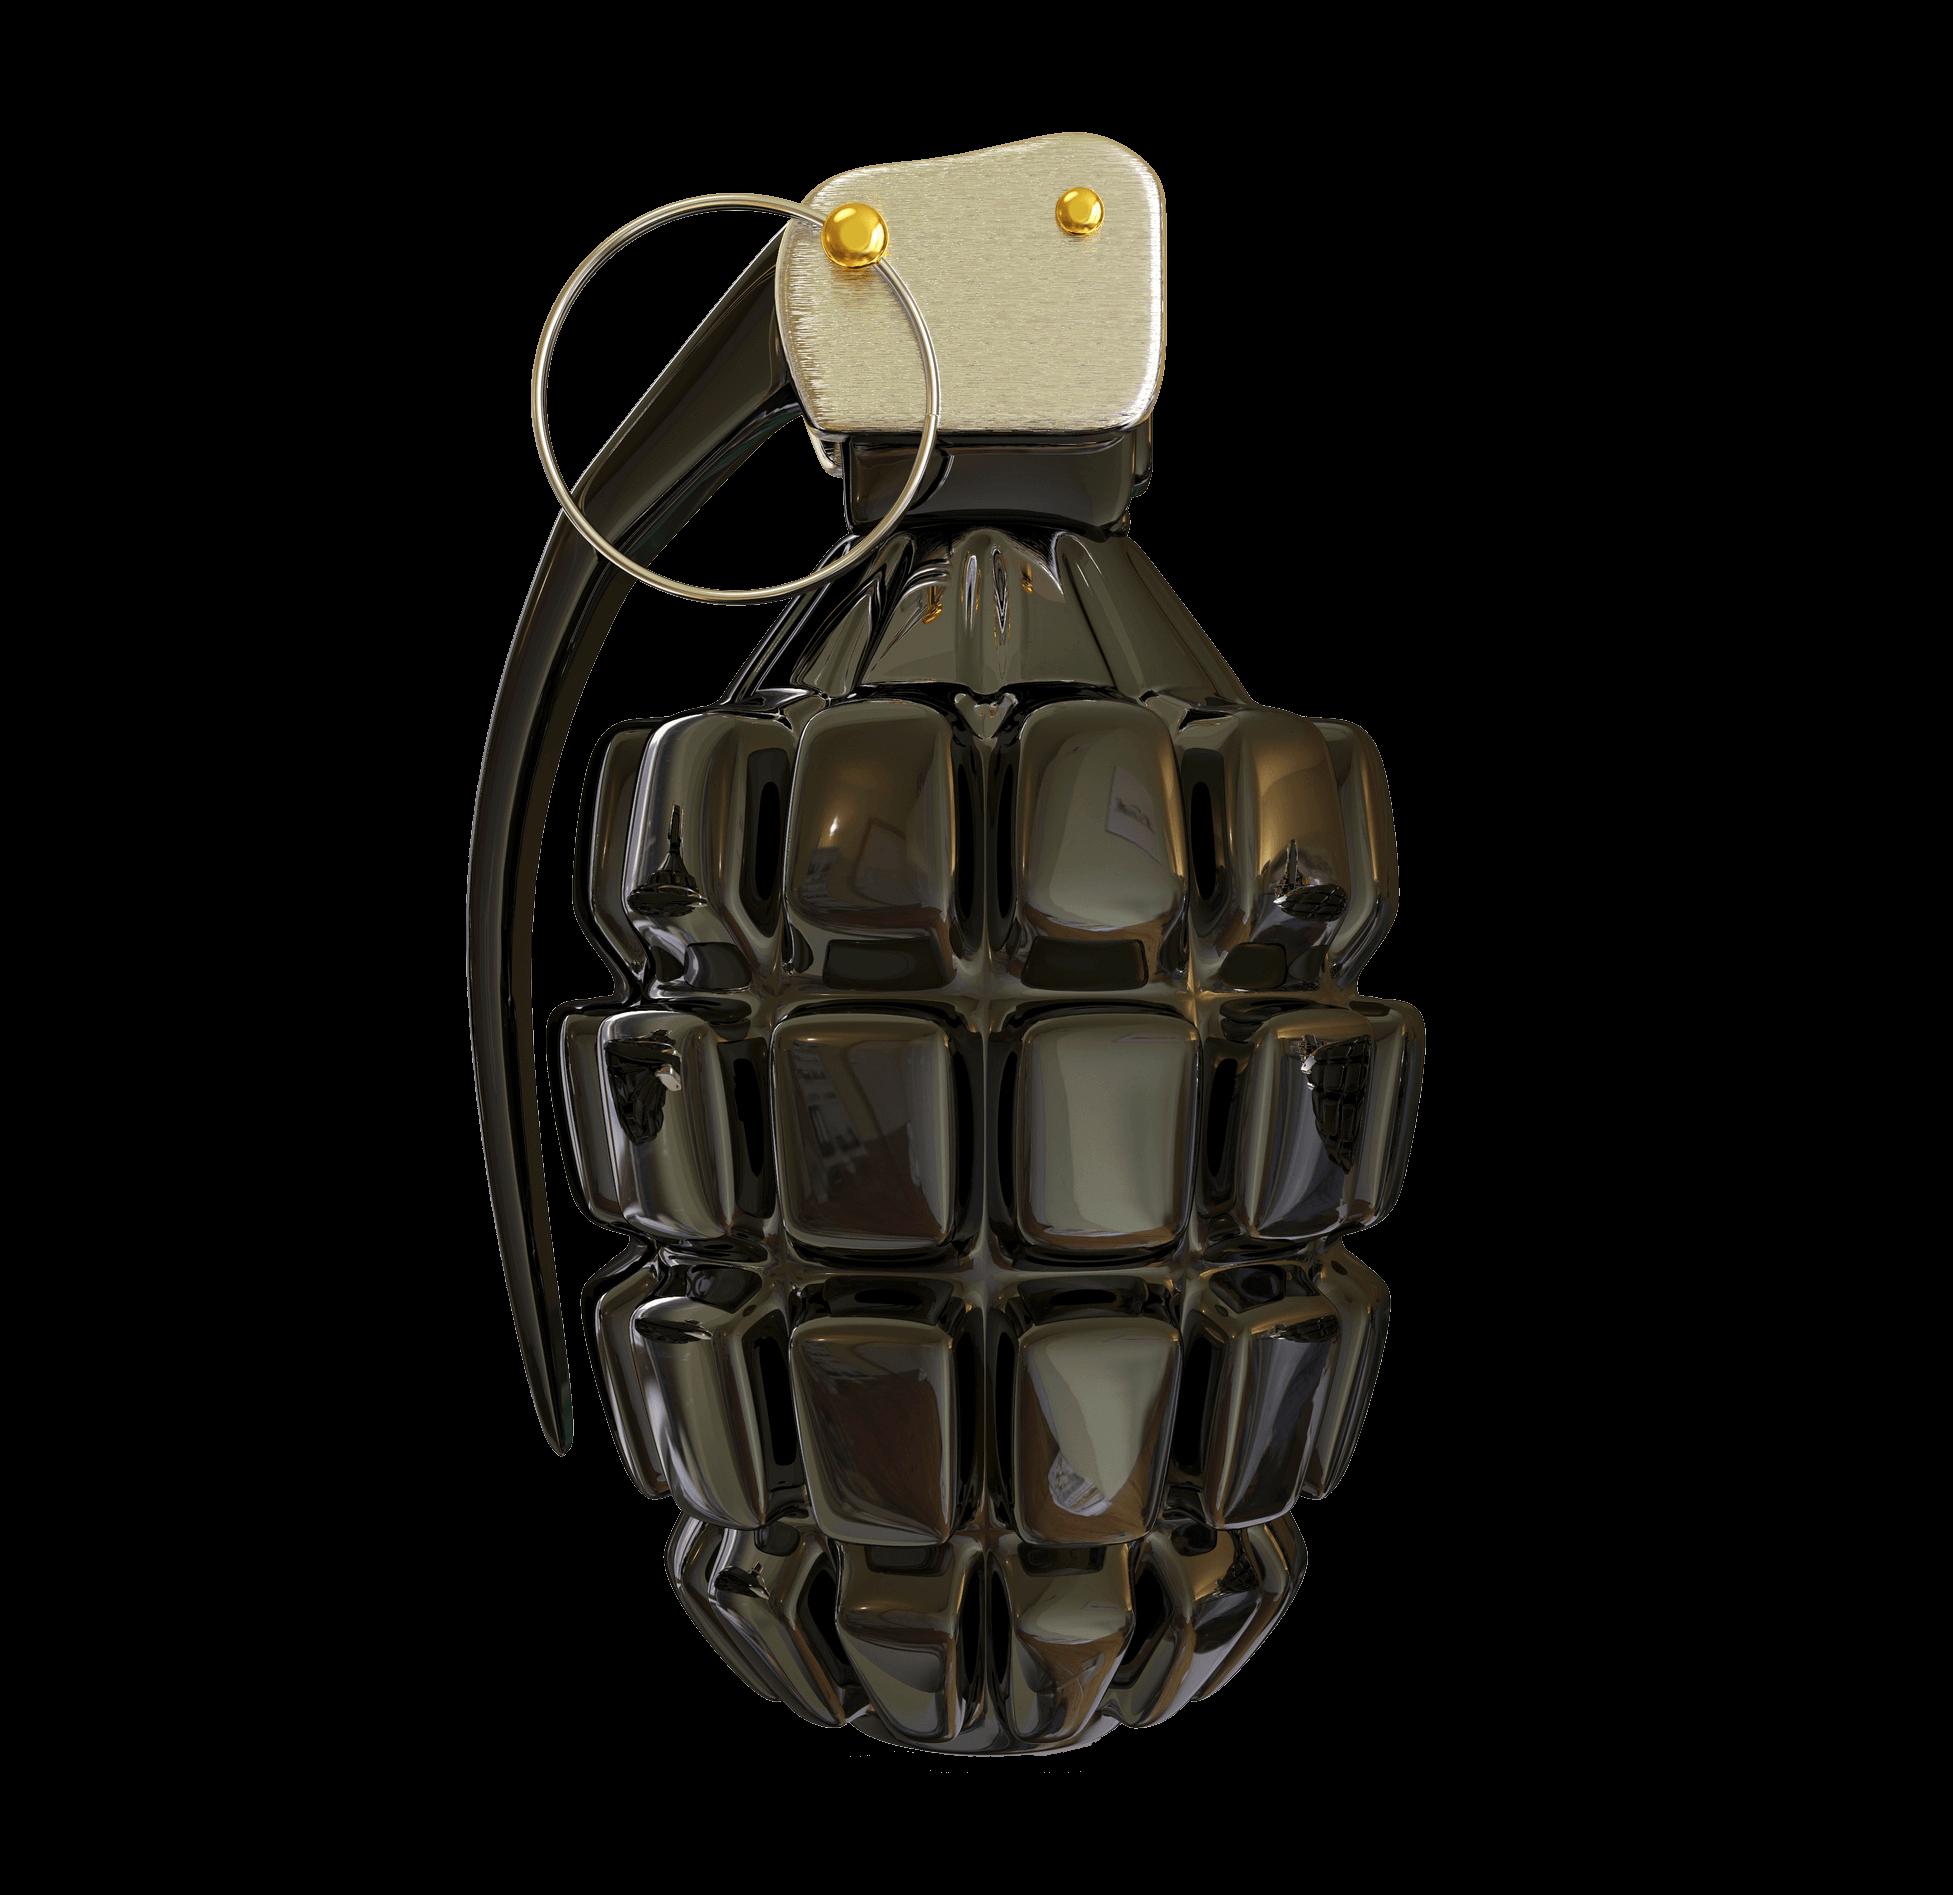 Shiny Grenade - Grenade, Transparent background PNG HD thumbnail